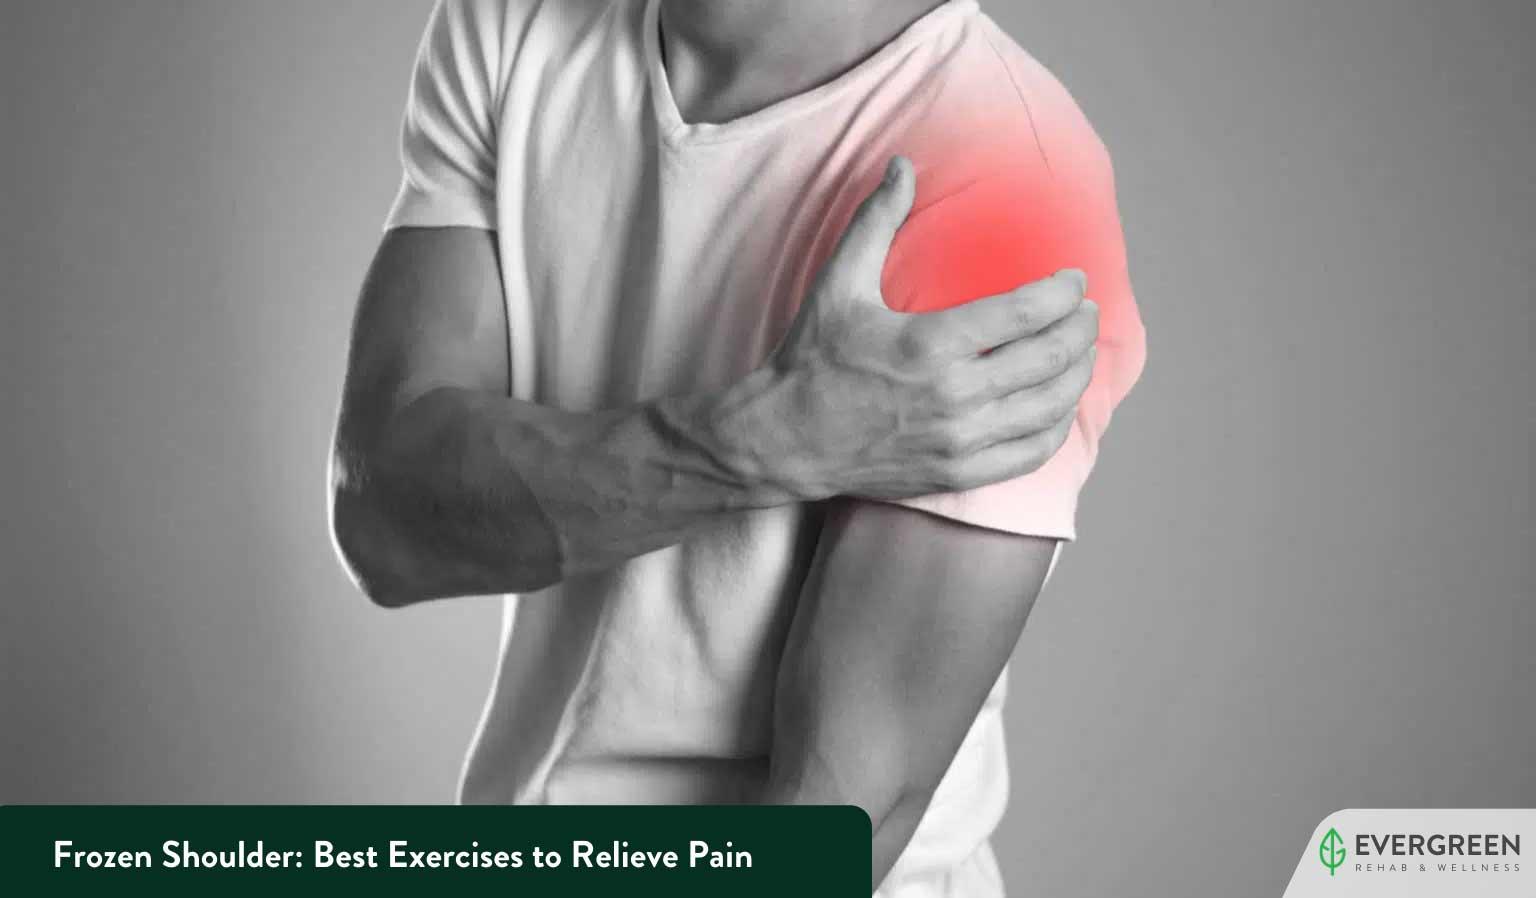 Frozen Shoulder: Best Exercises to Relieve Pain